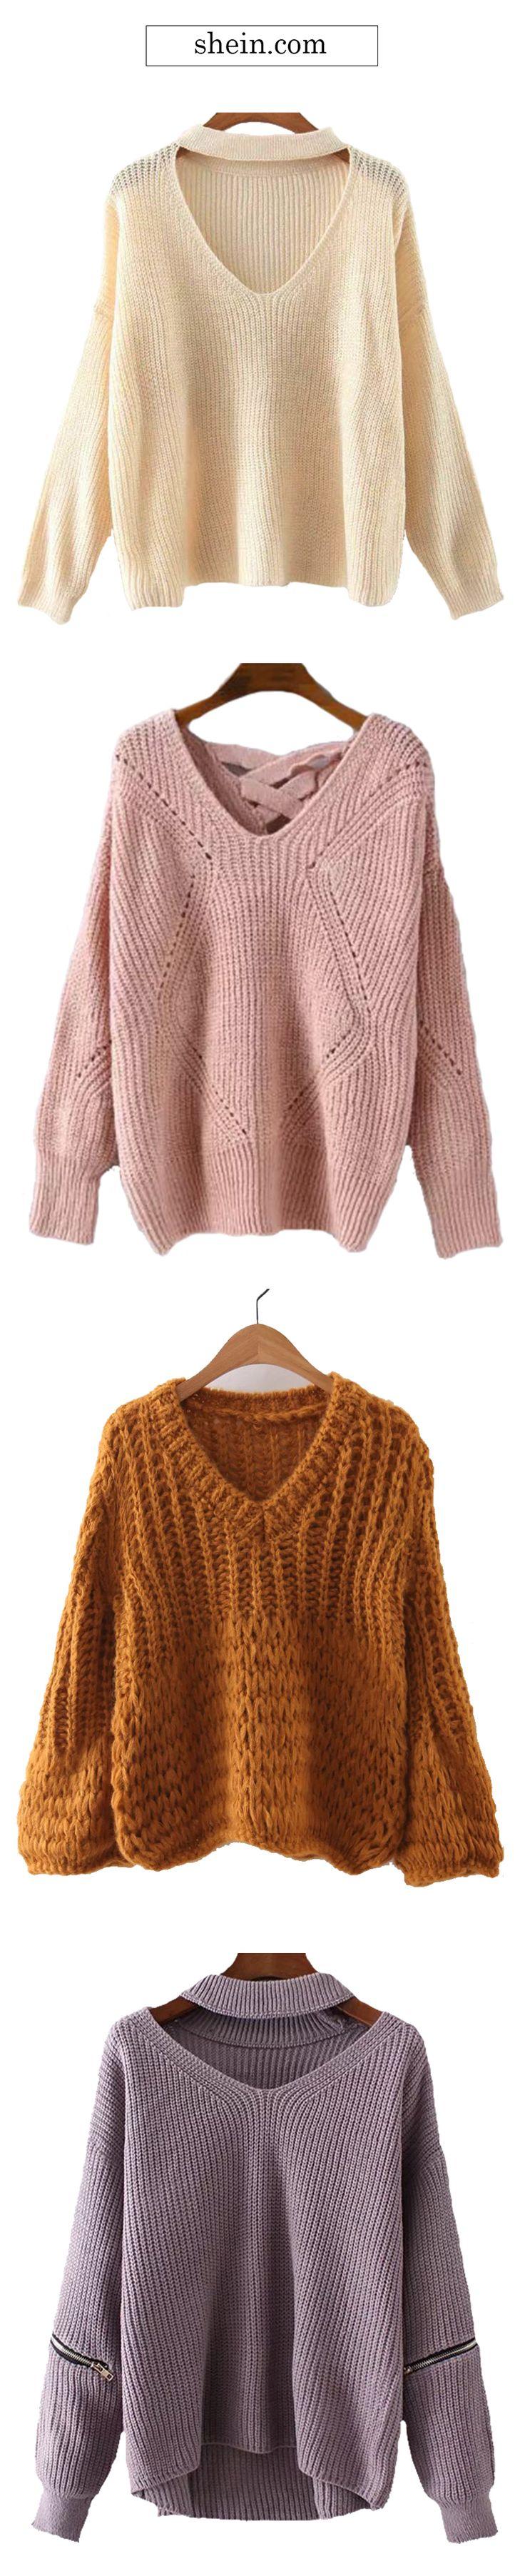 Cozy sweaters for women.